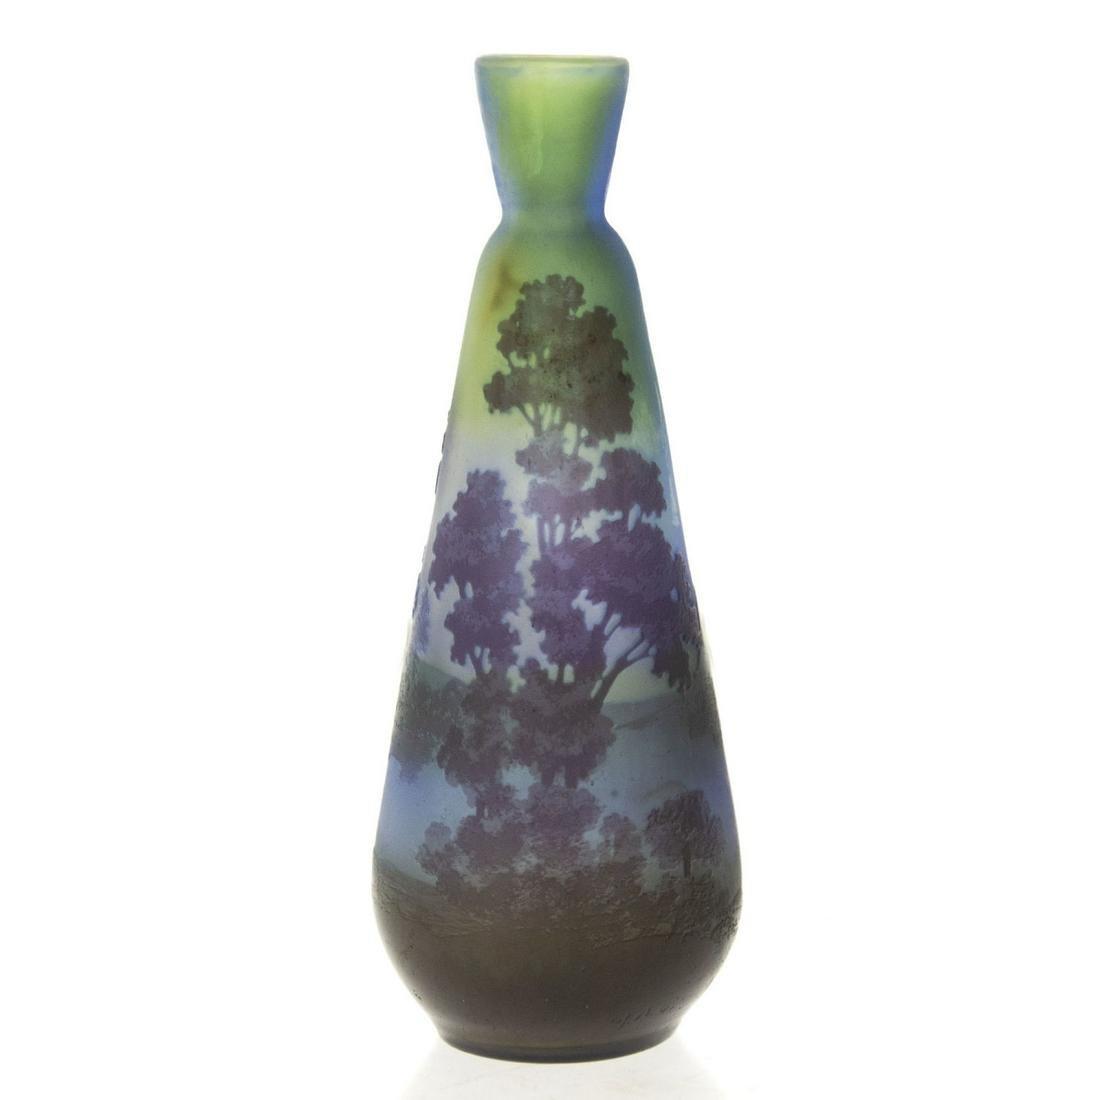 Galle Cameo Glass Vase, France, Circa 1900.